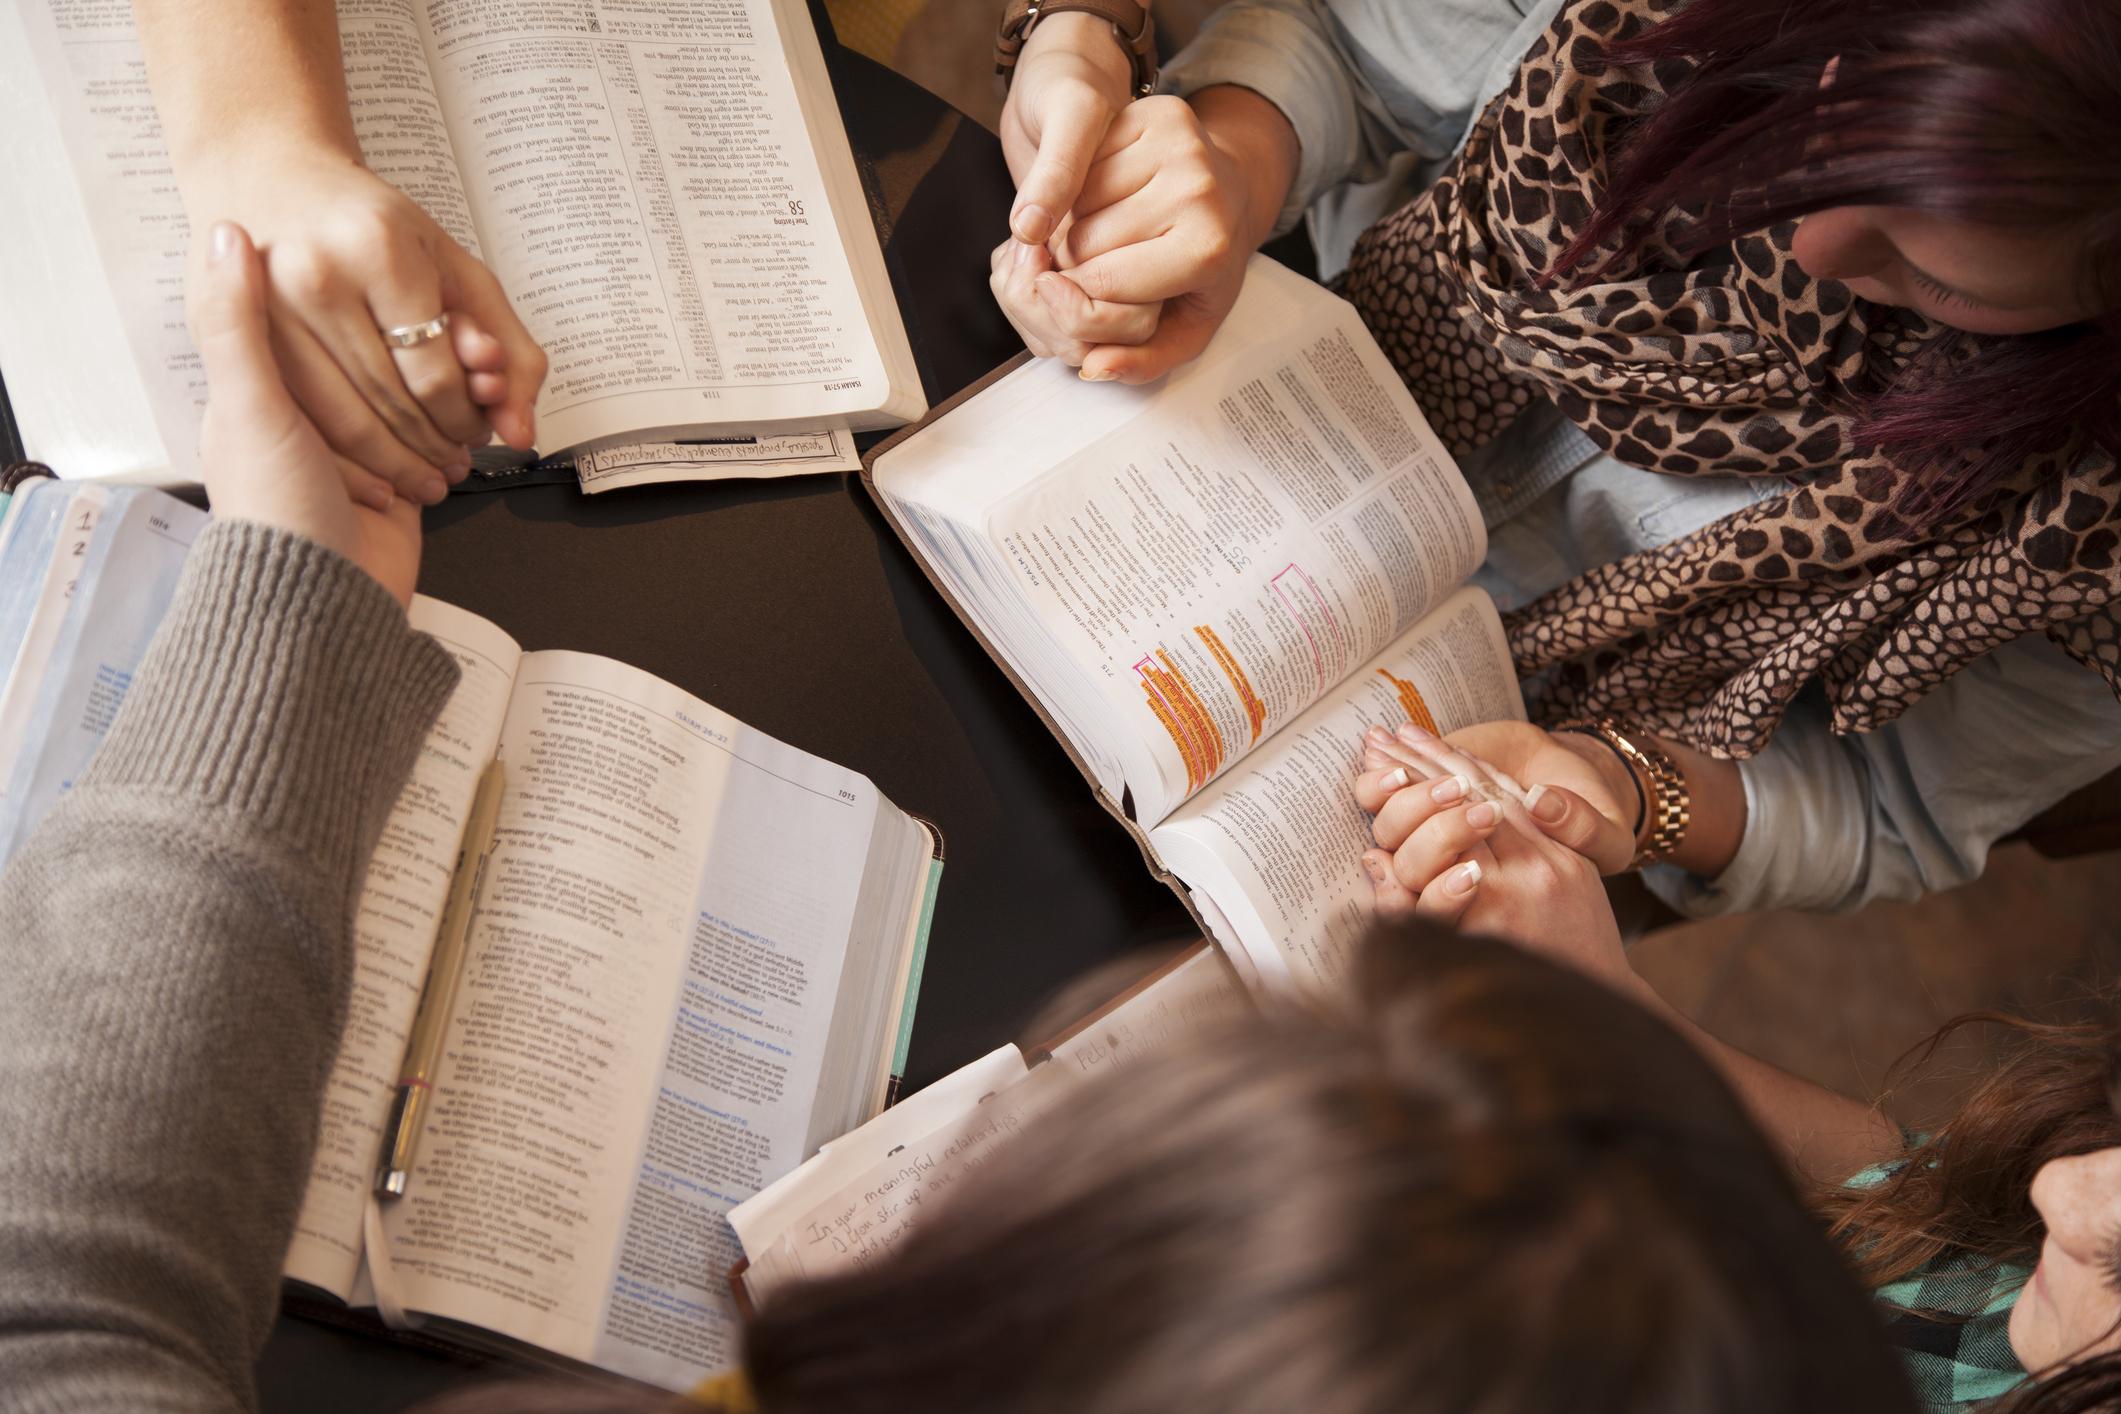 Books on the Bible | America Magazine